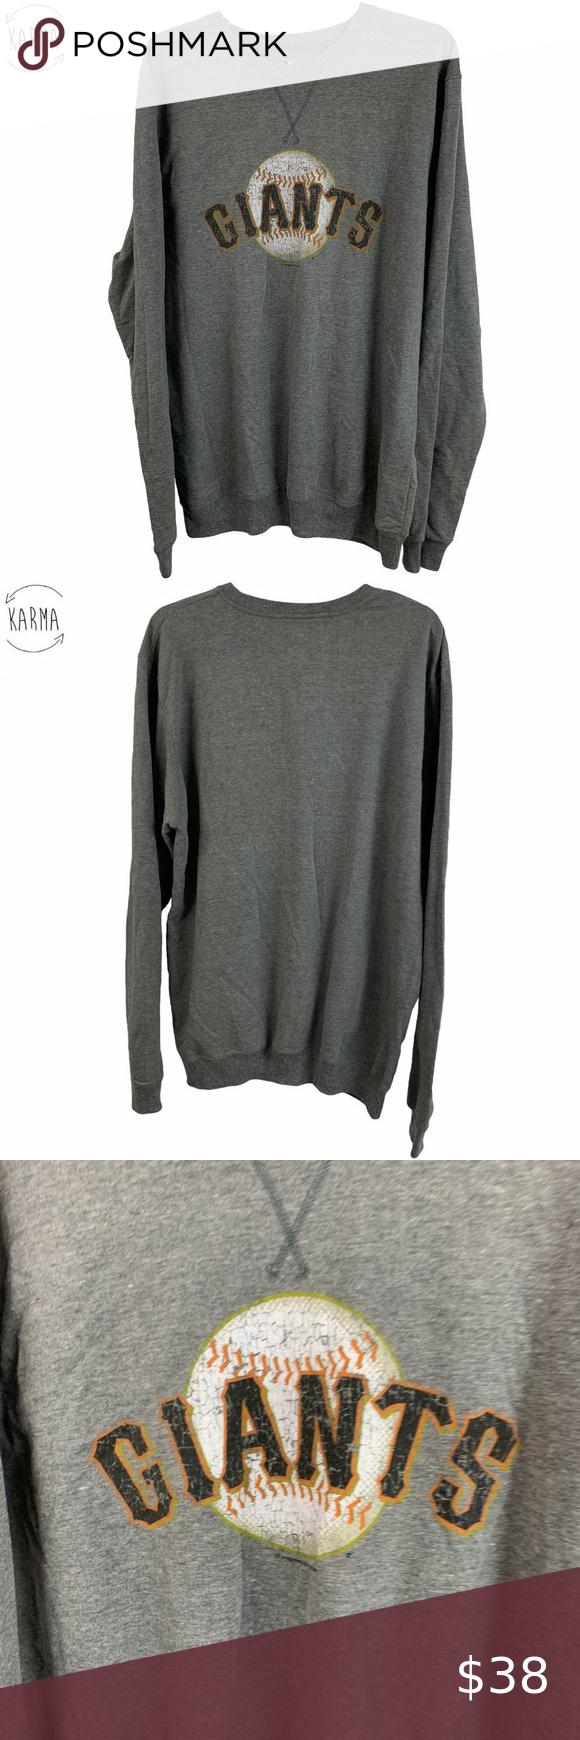 San Francisco Giants Sweater Womens Size 2xl B07 Sweaters For Women Sweaters Pullover Sweaters [ 1740 x 580 Pixel ]